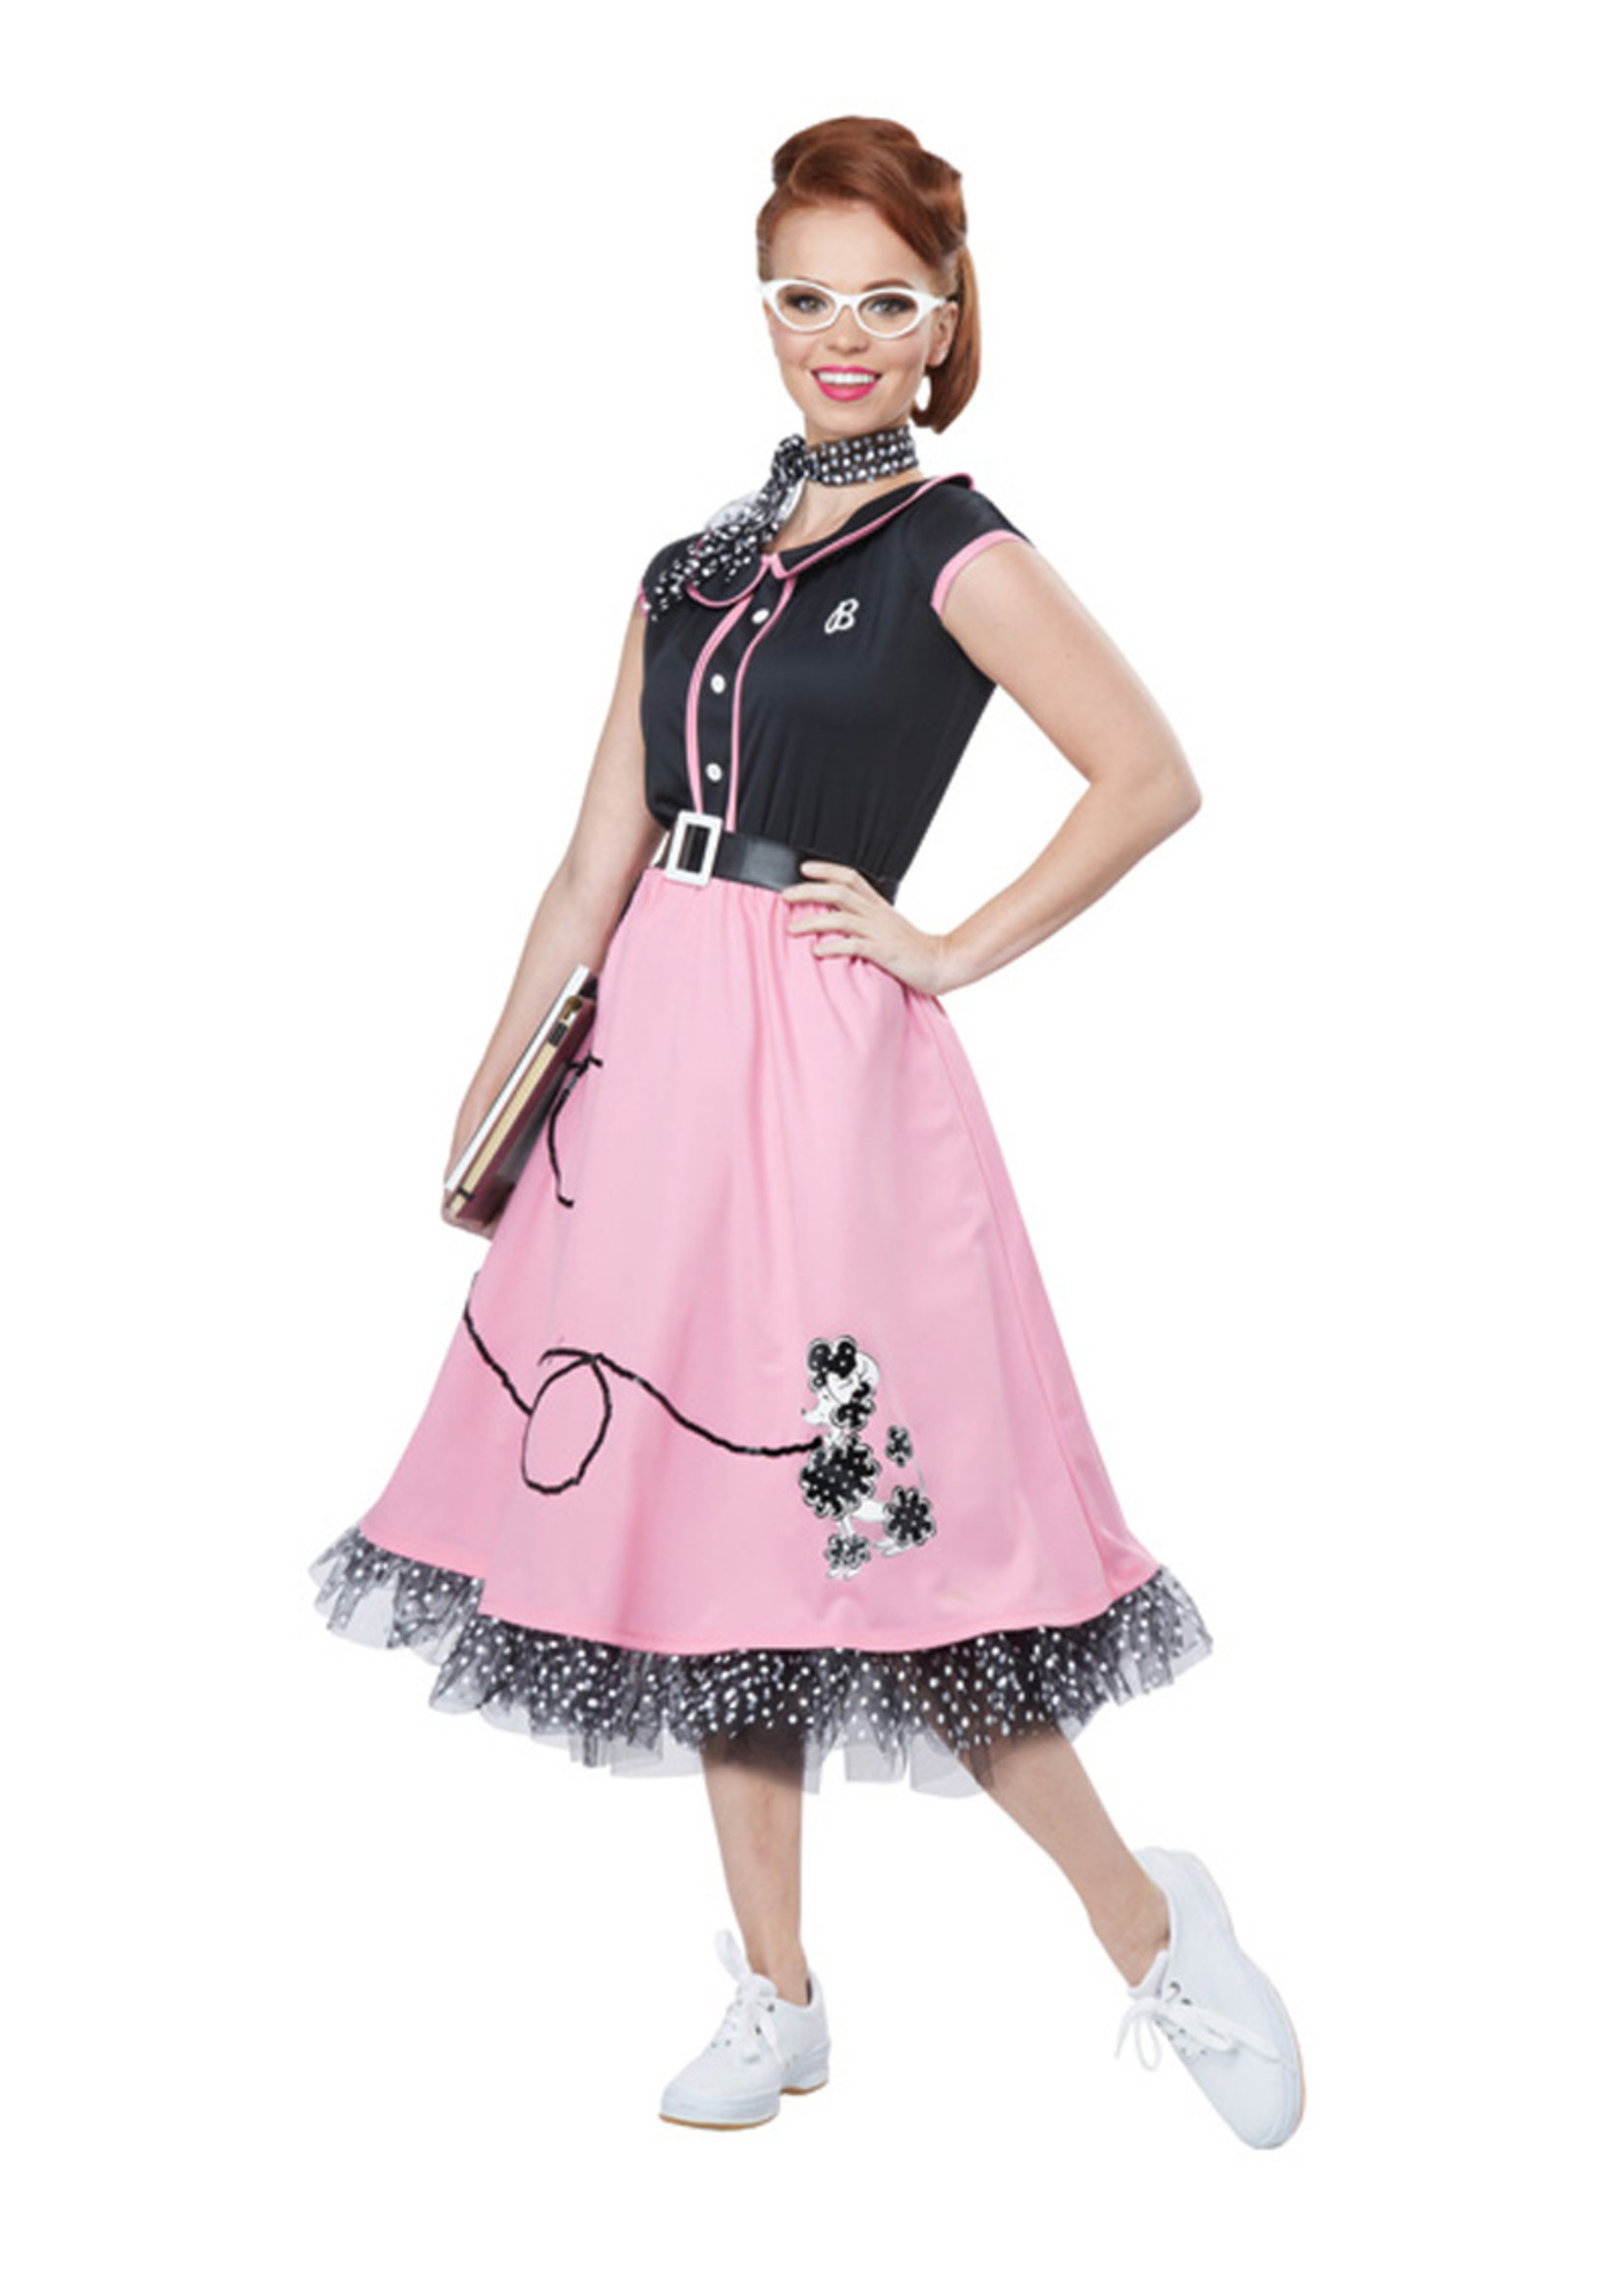 50's Sweetheart Costume - Women's